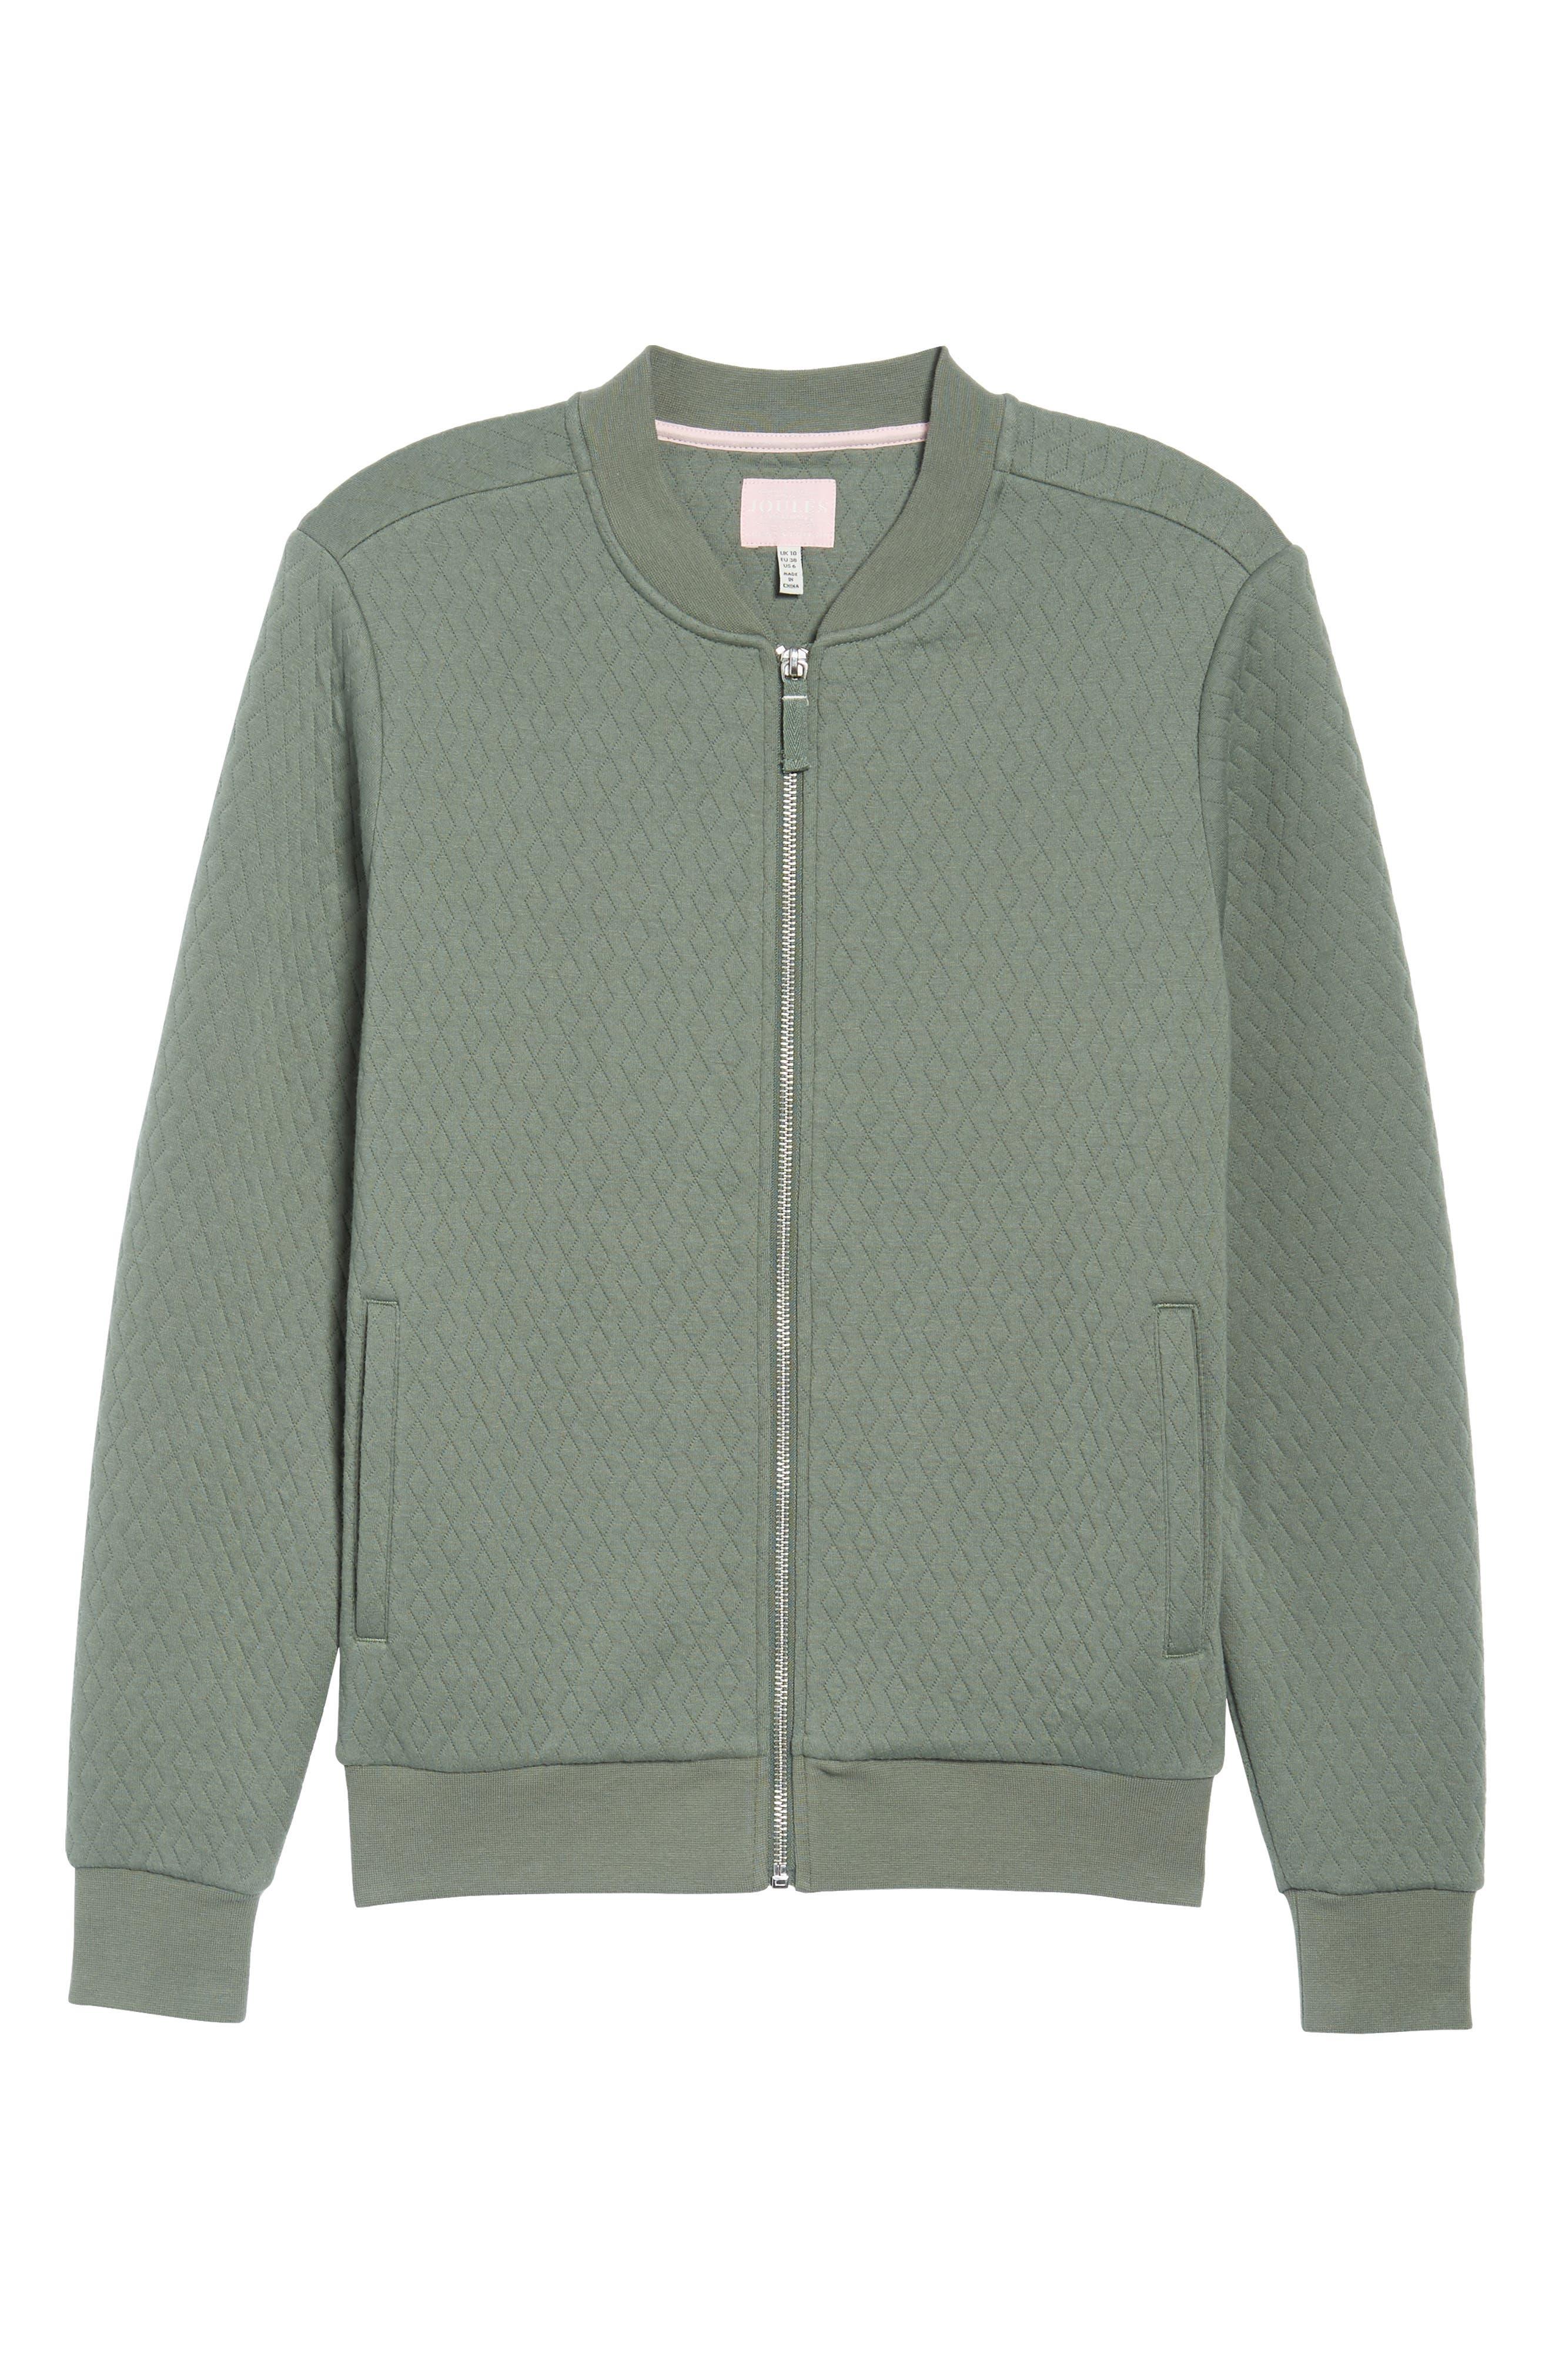 Joules Millie Bomber Sweatshirt Jacket